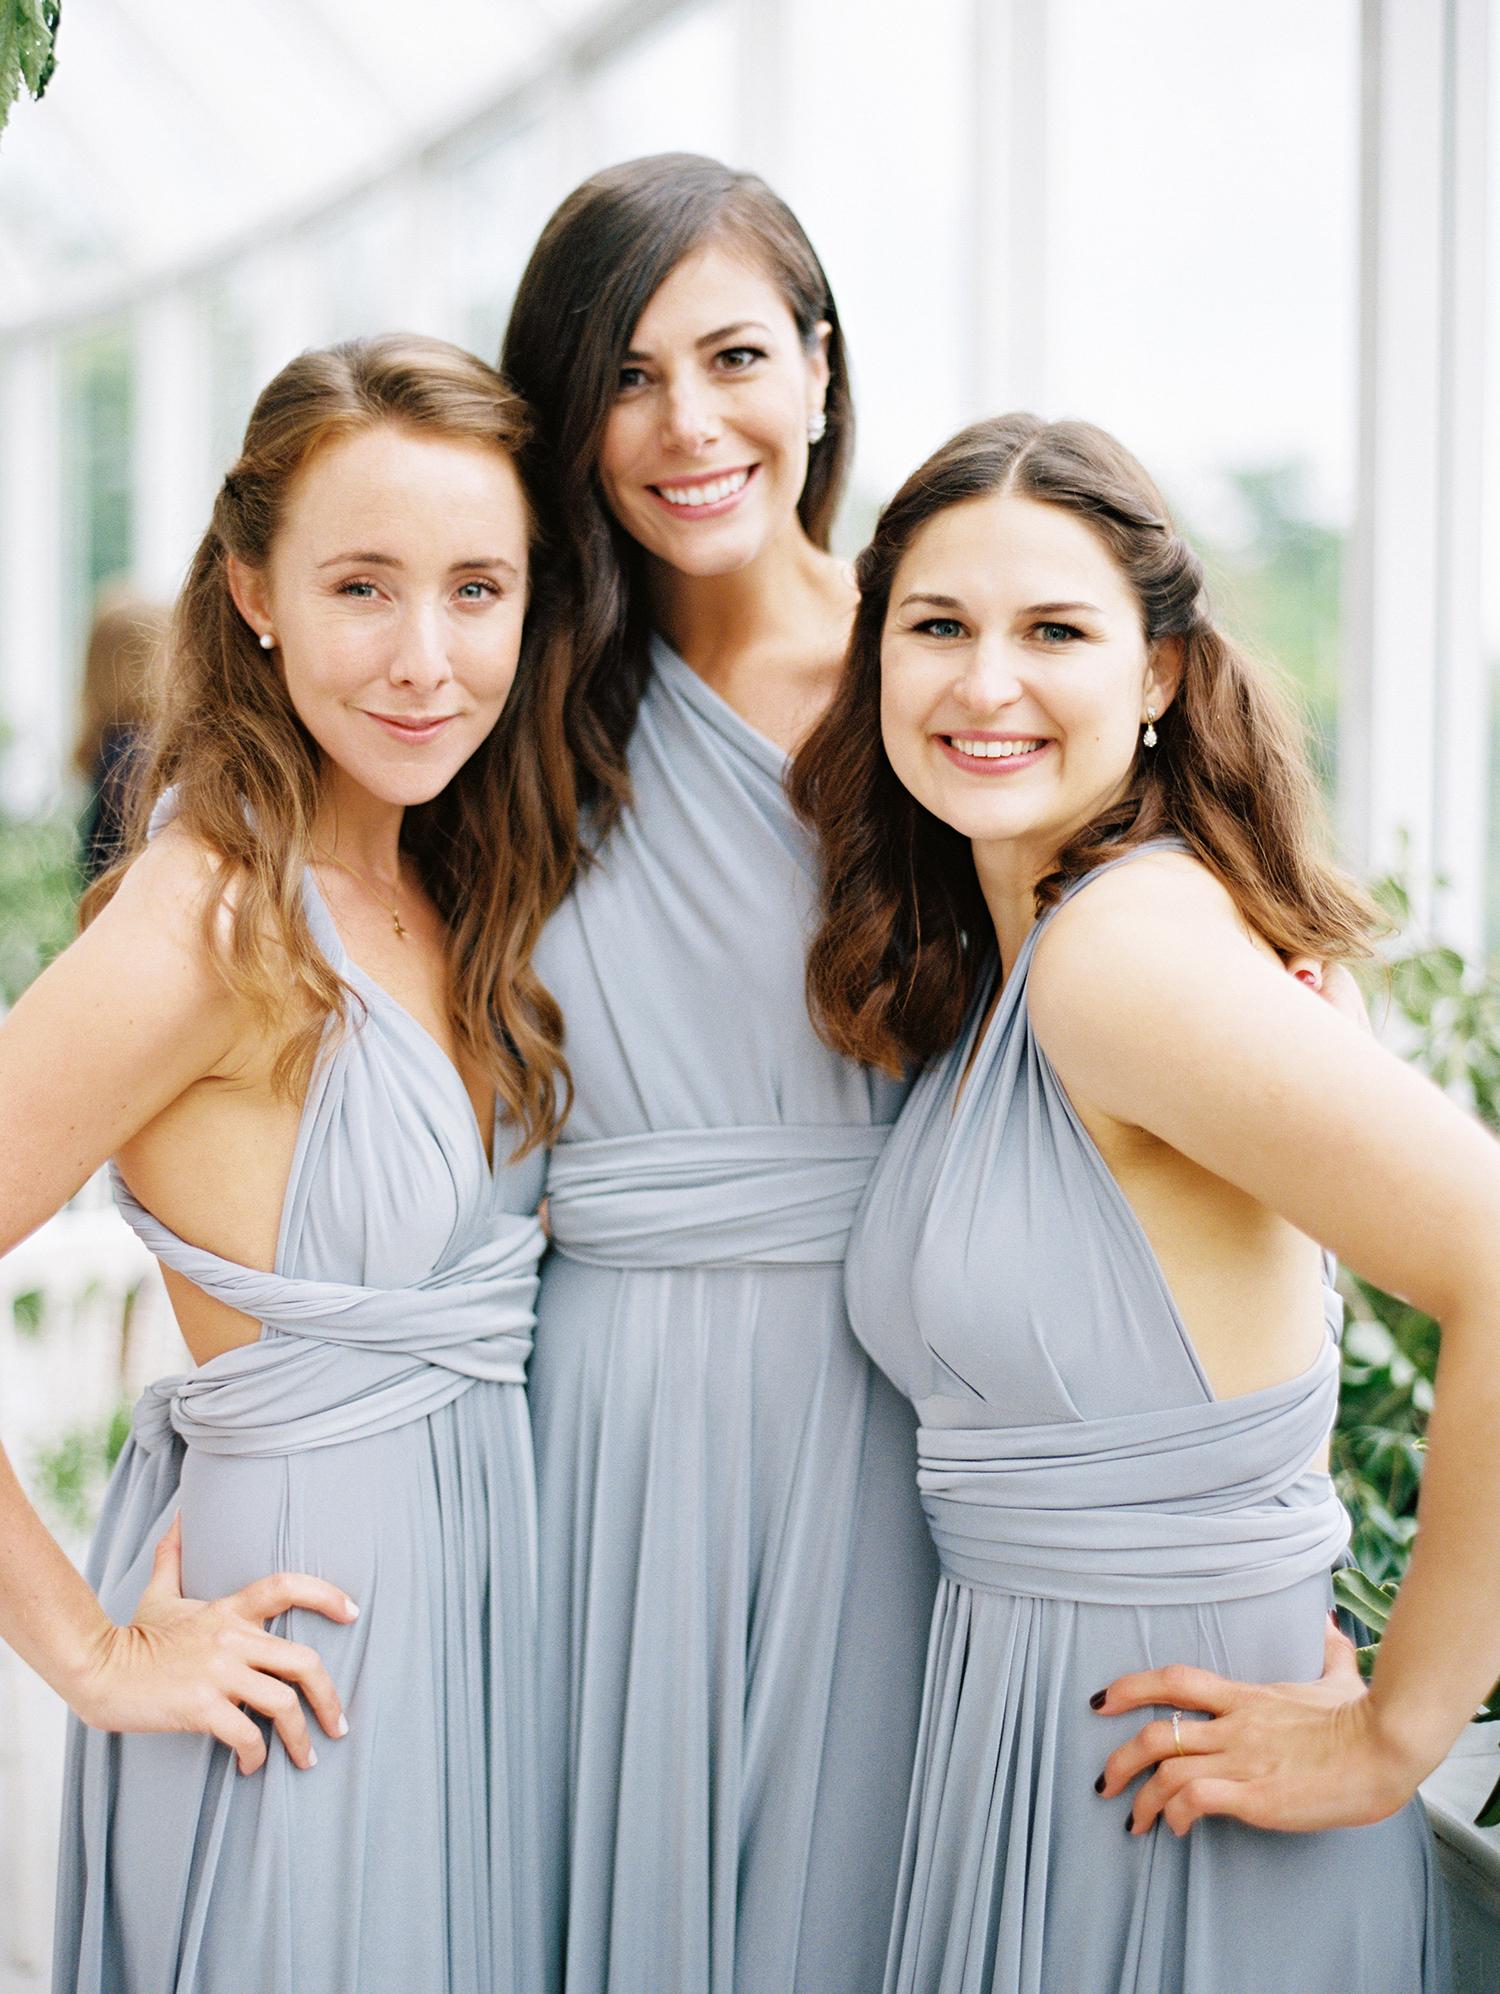 amanda alex wedding three bridesmaids portrait